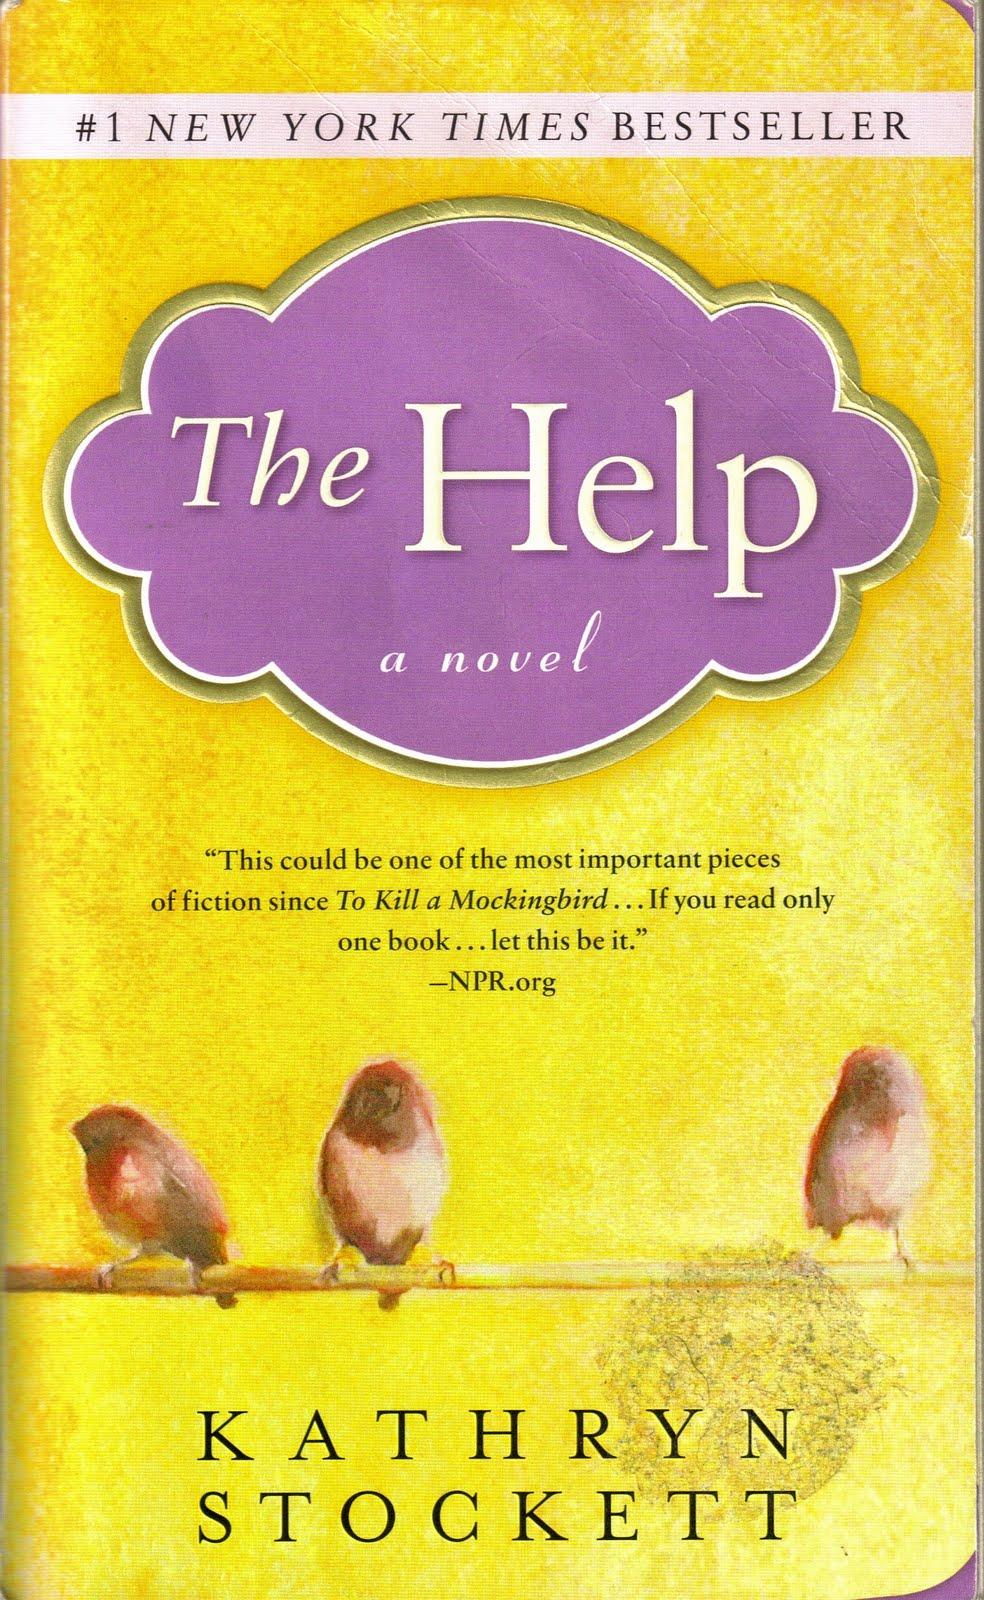 the help by kathryn stockett essay hook in a essay kurt vonnegut slaughterhouse five